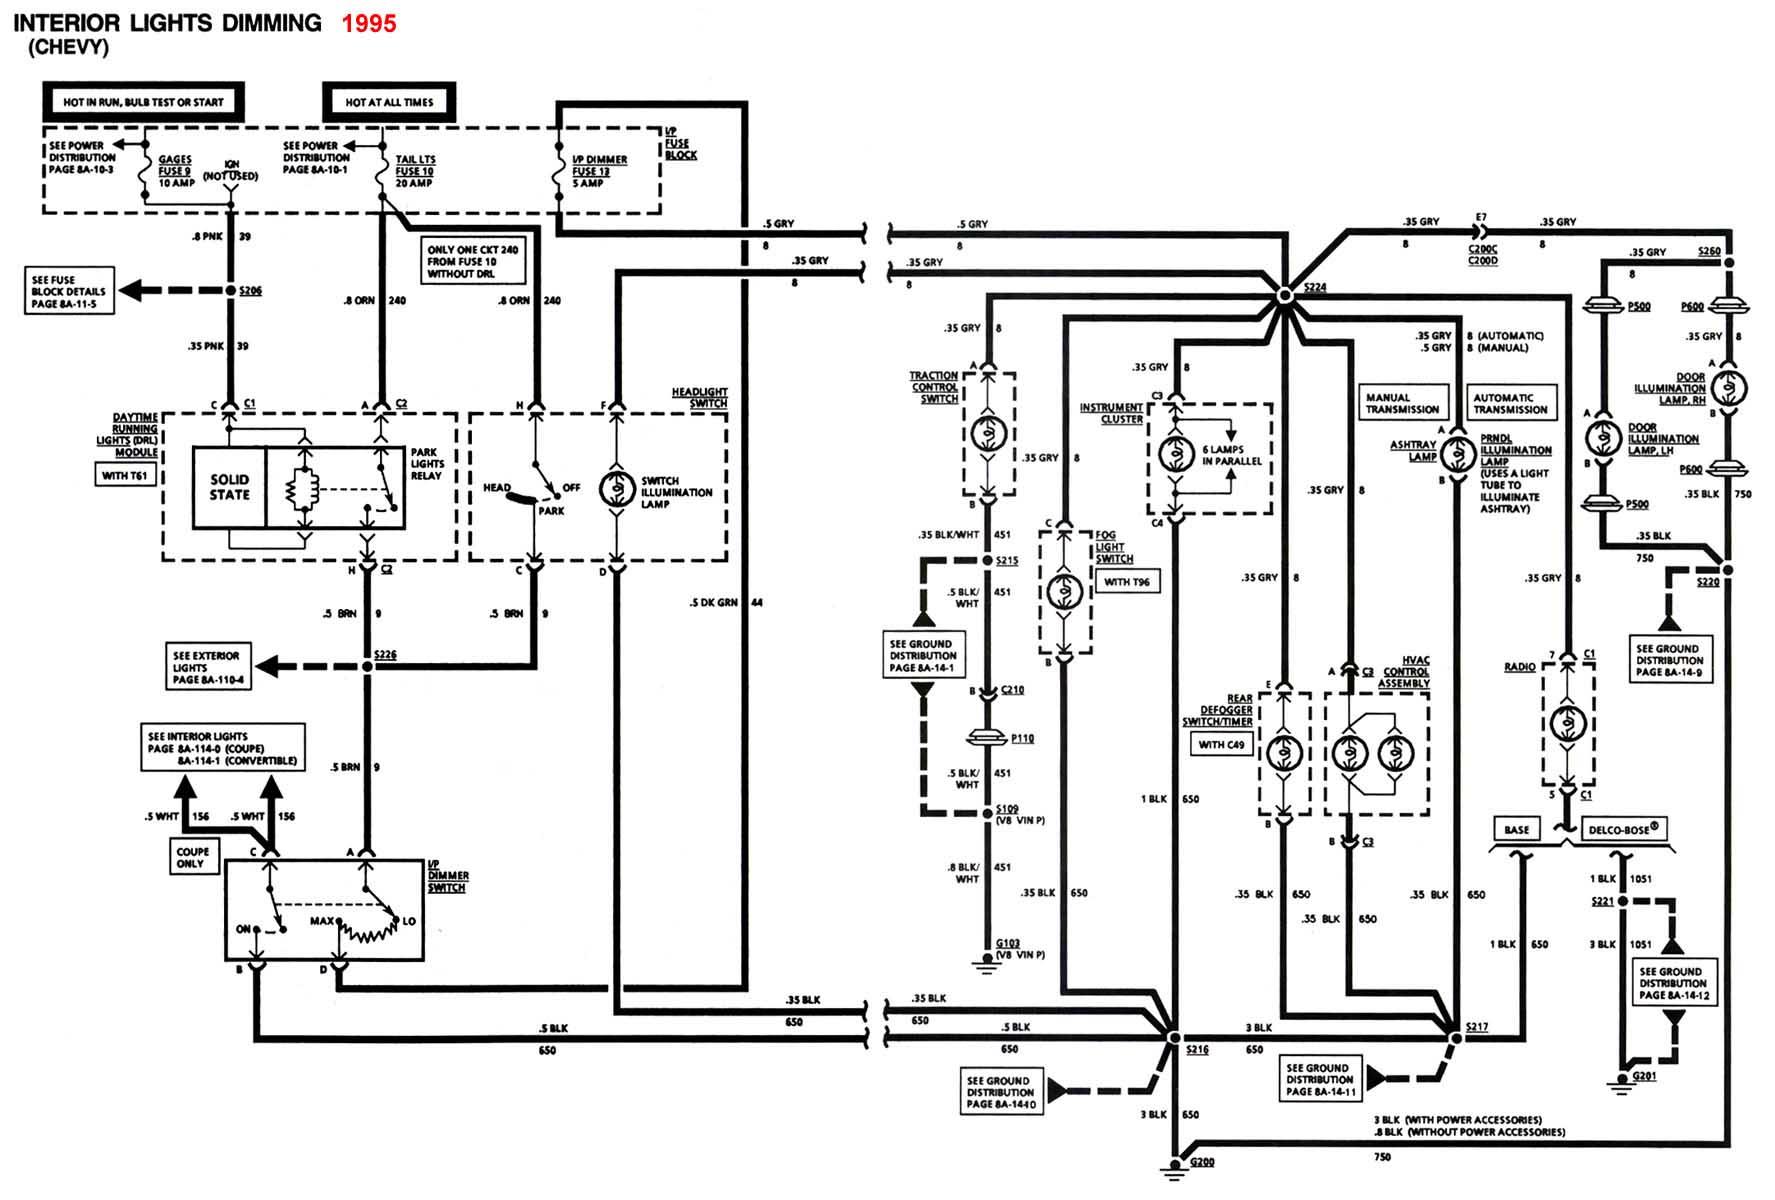 4 3 volvo penta alternator wiring diagram home phone dsl 95 camaro topdns organisedmum de 4th gen lt1 f body tech aids rh shbox com harness